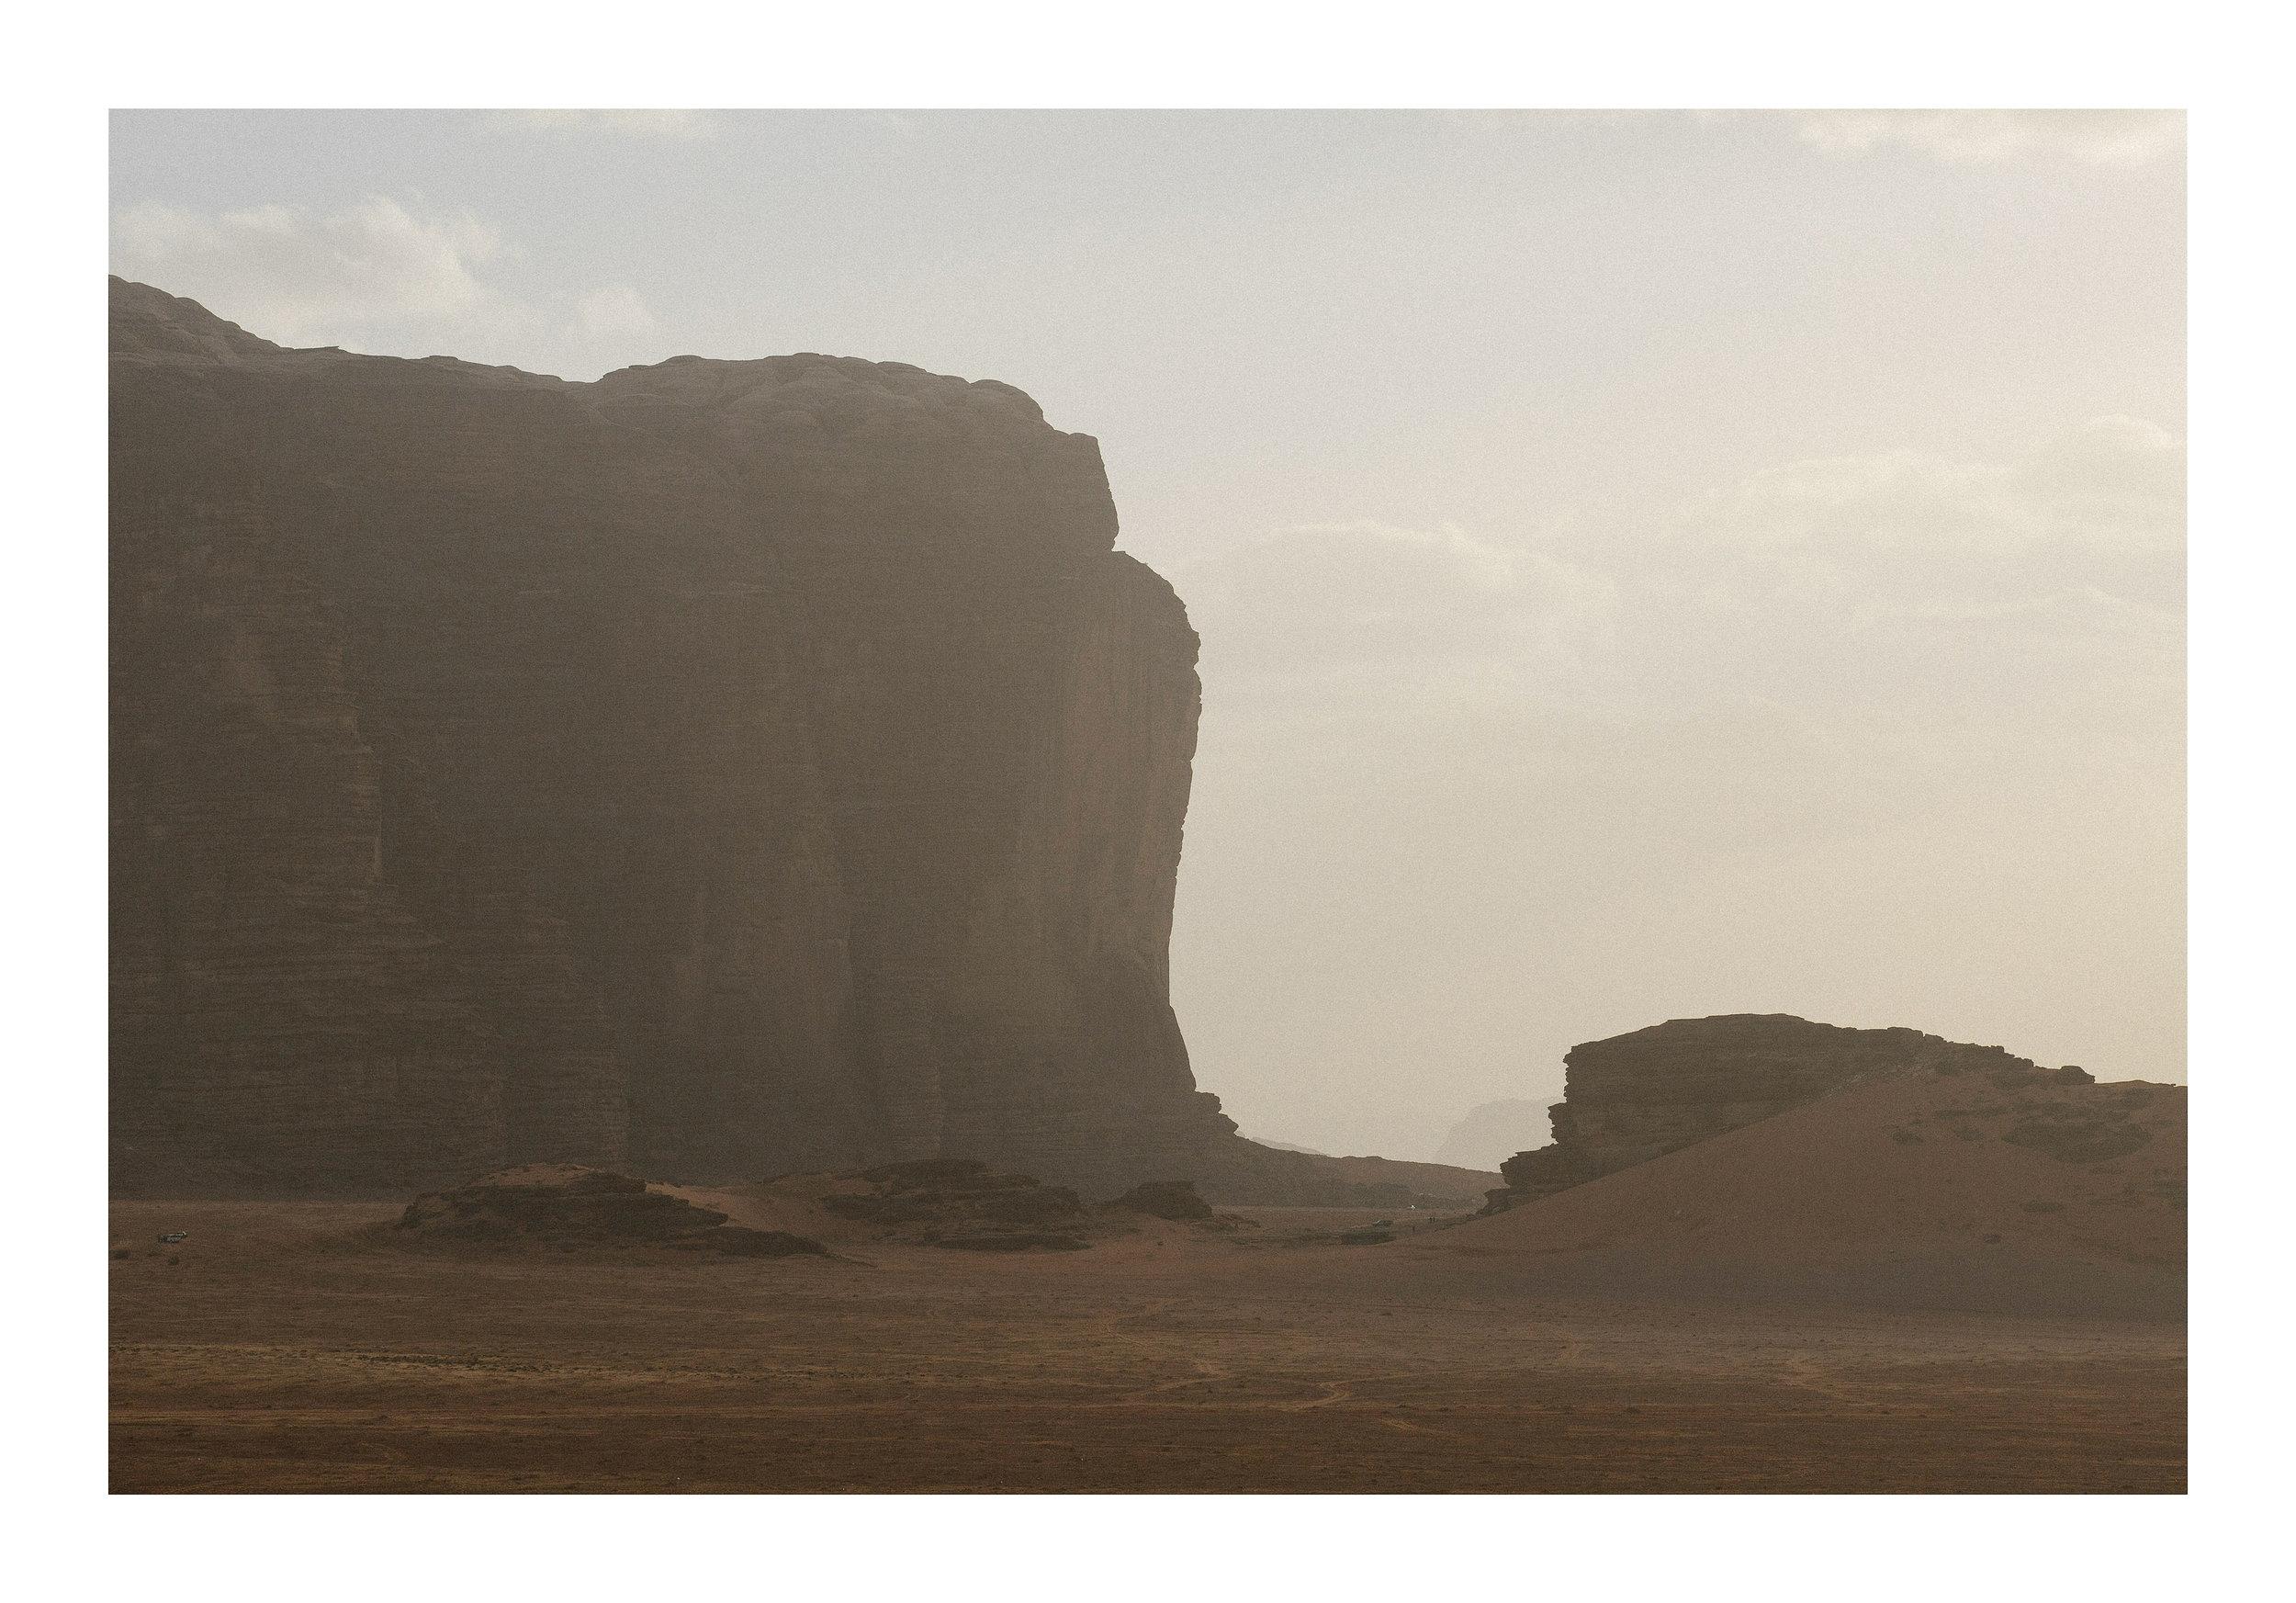 36 1902 JOR Wadi Rum 0216.JPG